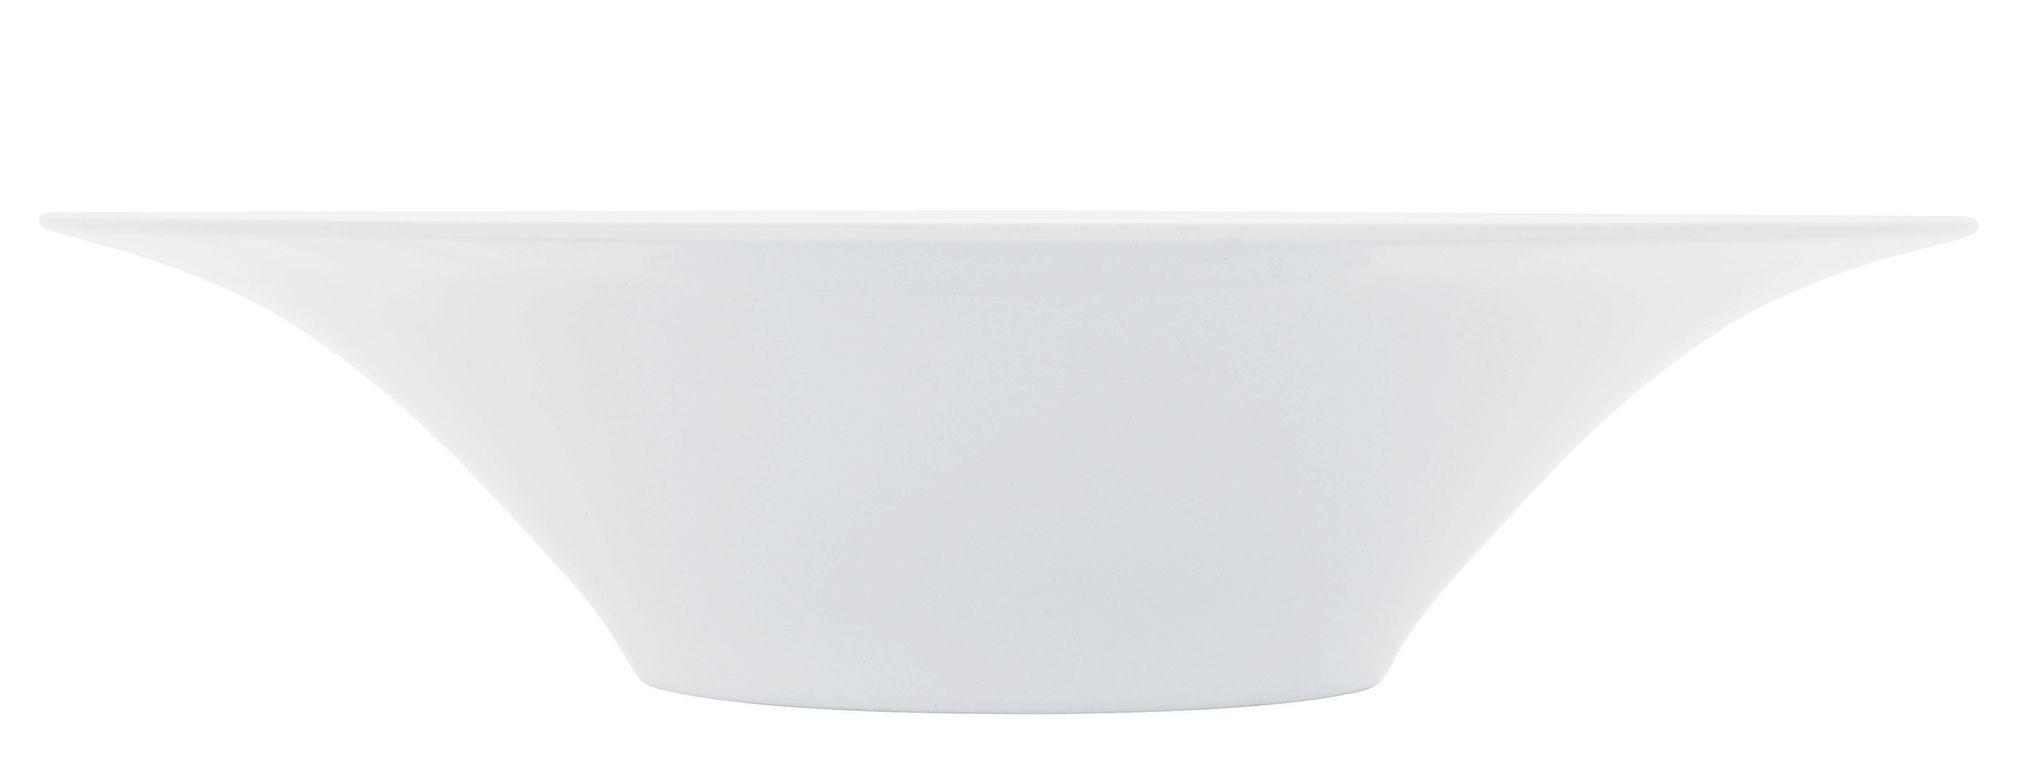 Tavola - Ciotole - Insalatiera Ku di Alessi - Bianco - Porcellana